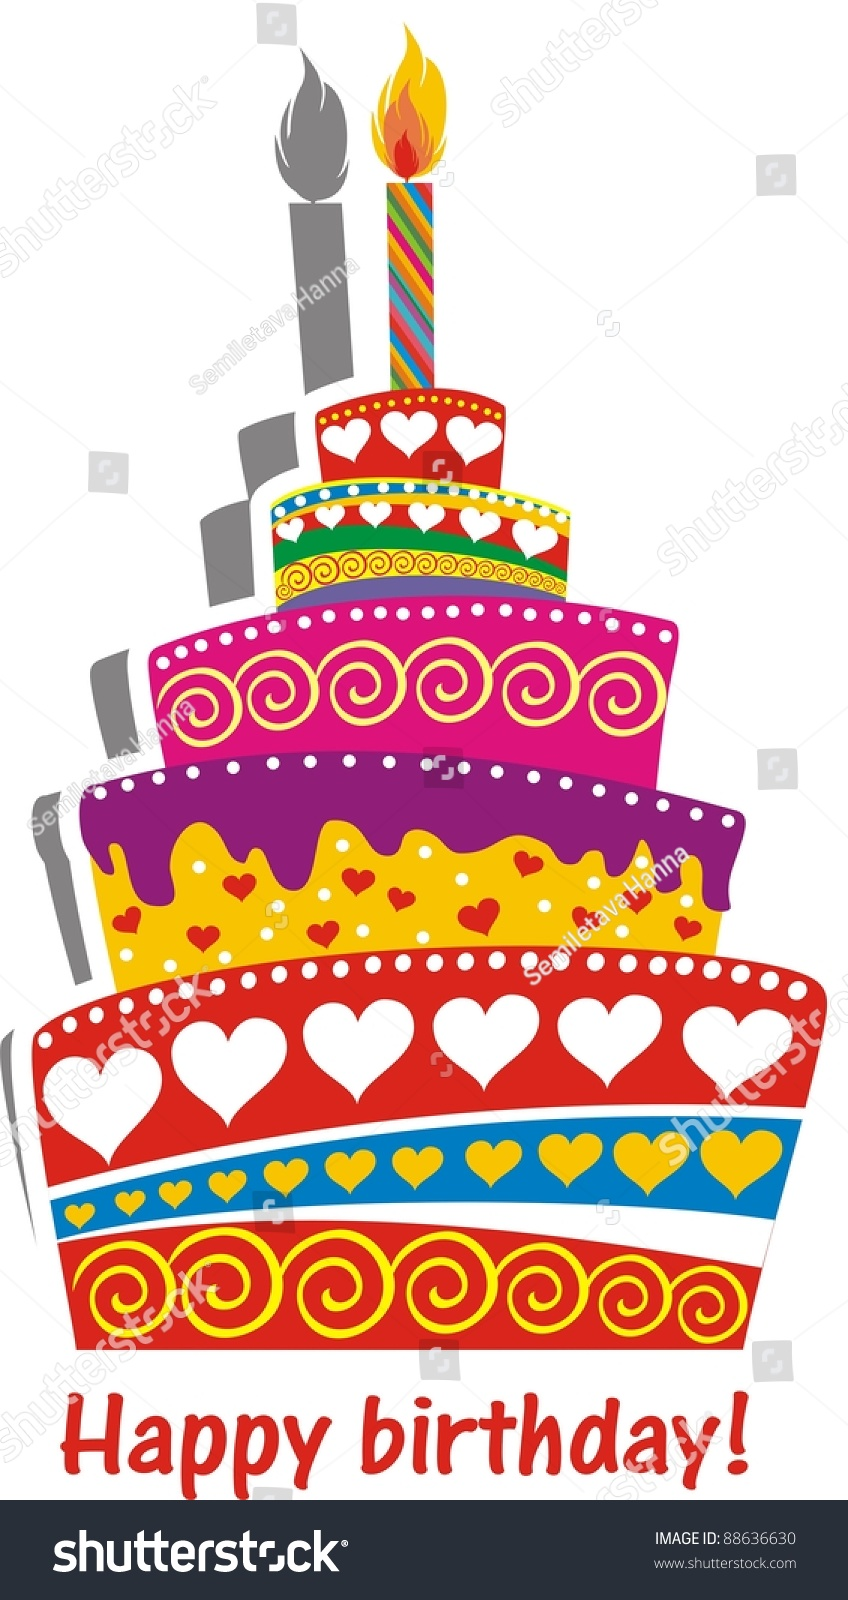 Birthday Cake. Illustration - 88636630 : Shutterstock